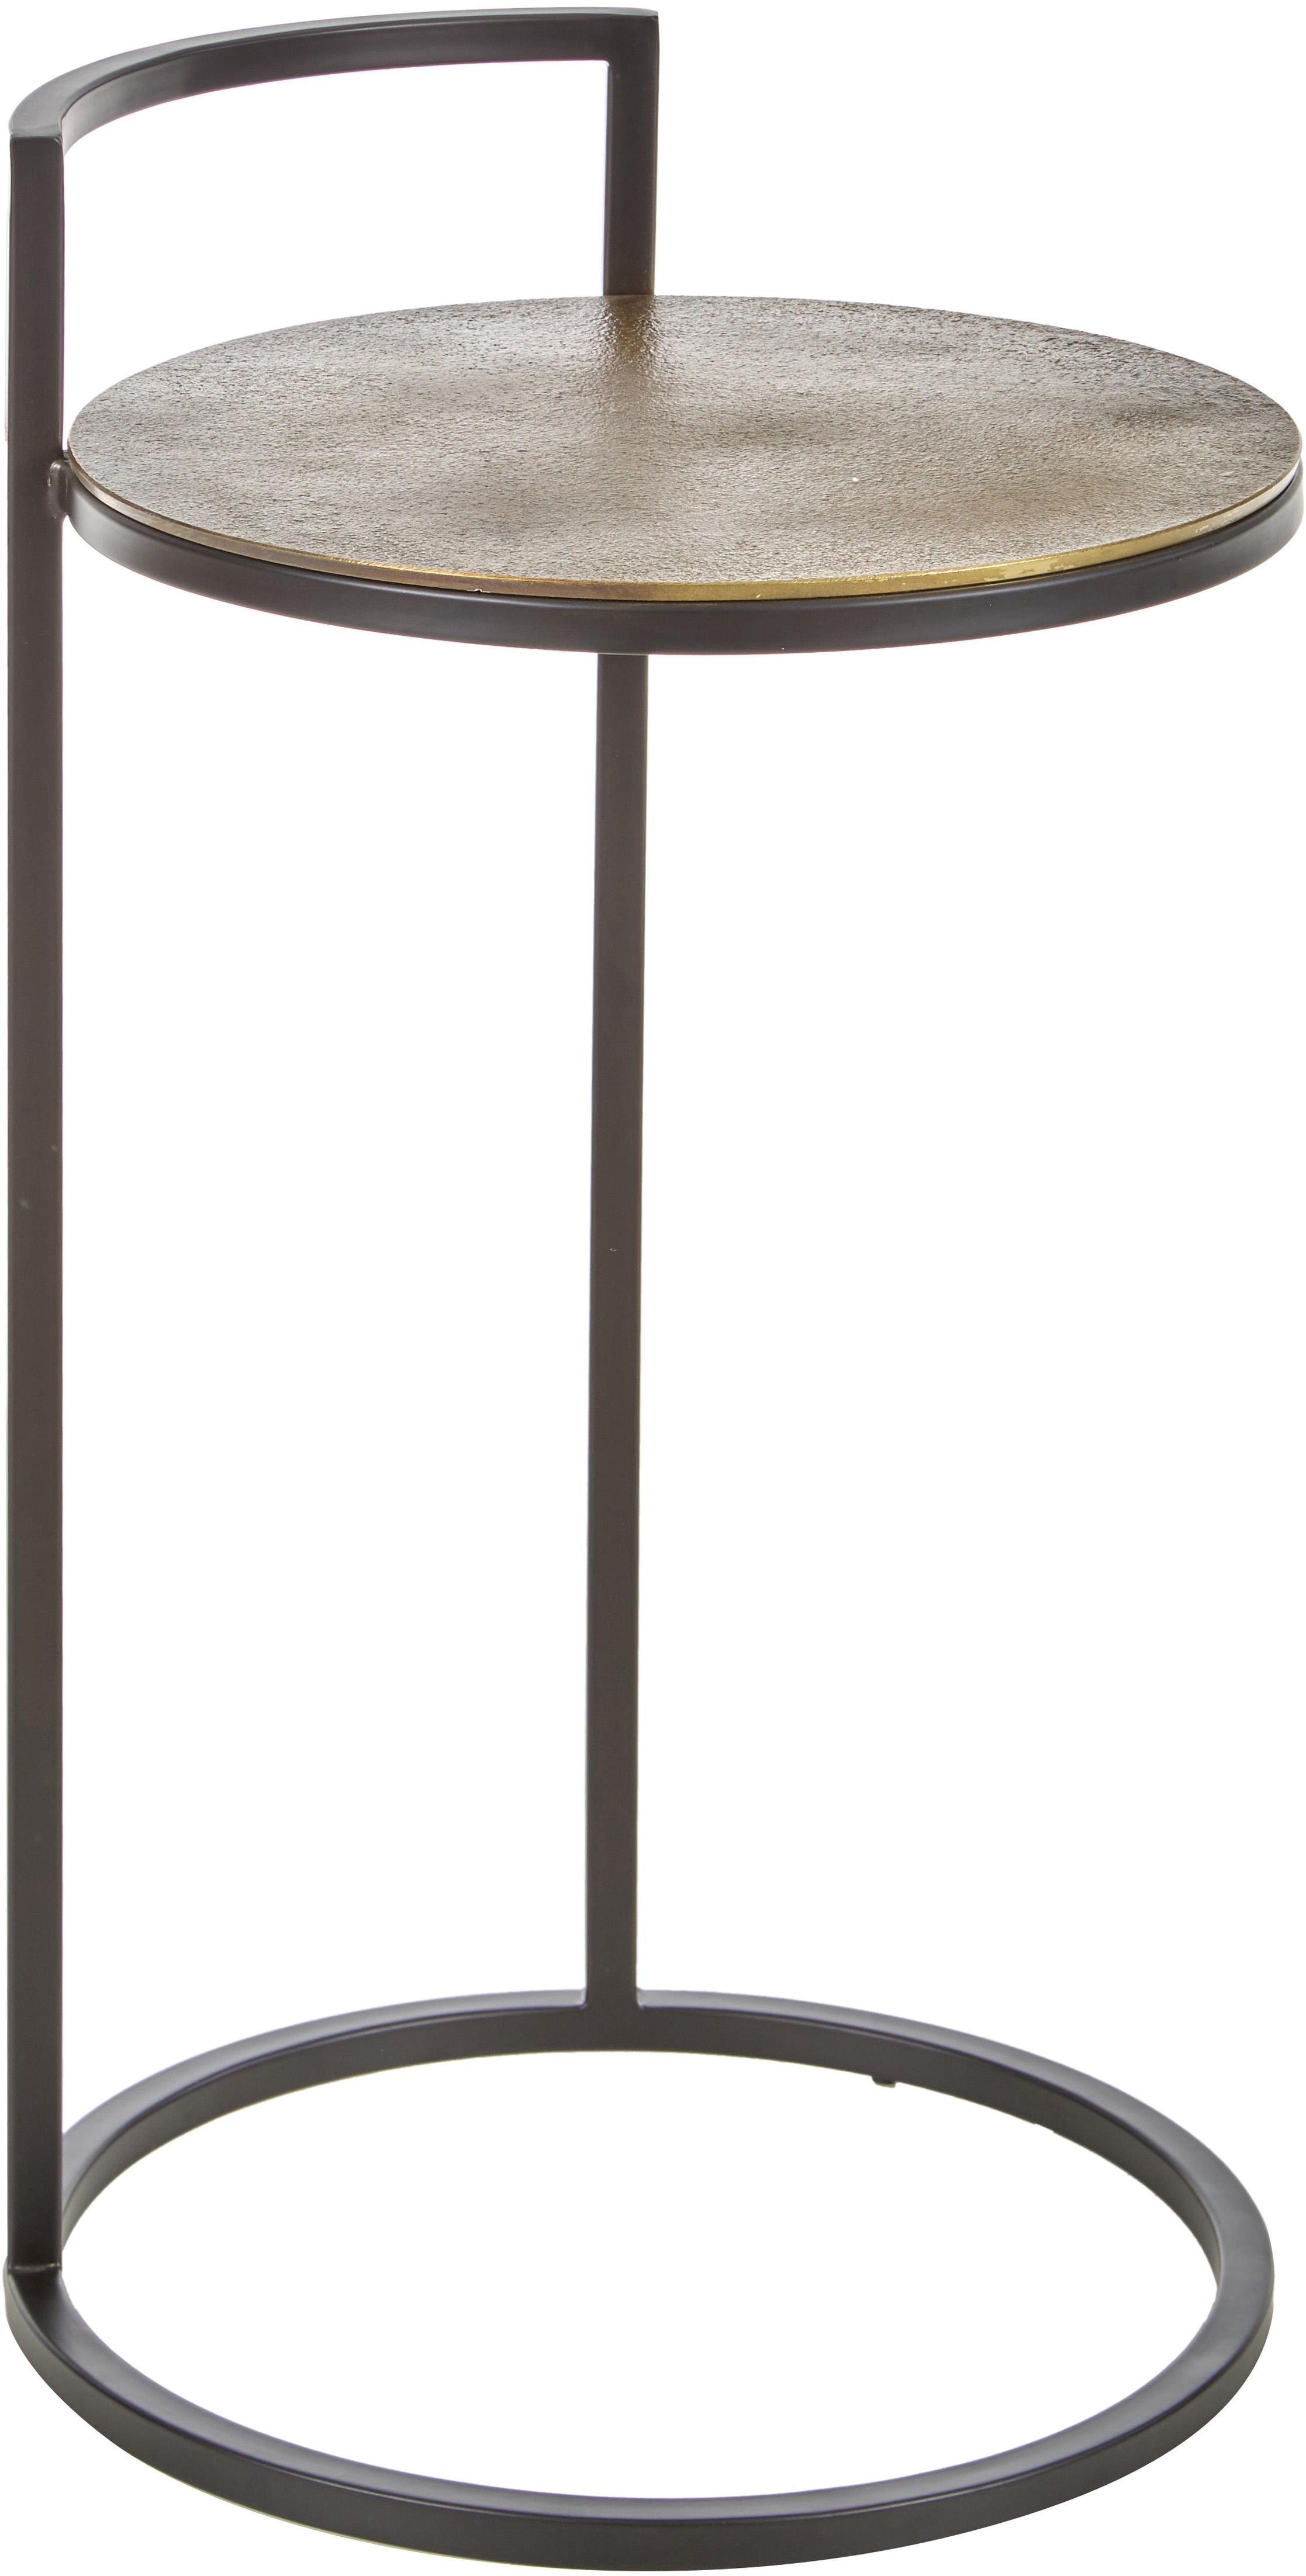 Mesa auxiliar redonda de metal Circle, Tablero: aluminio, recubierto, Estructura: metal pintado, Dorado, negro, Ø 36 x Alto 66 cm